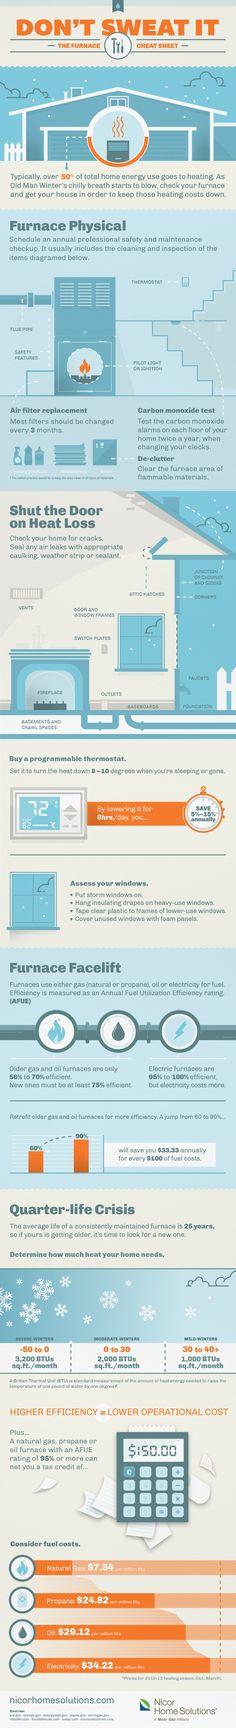 Don't Sweat It: The Furnace Cheat Sheet   #Infographic #Furnace